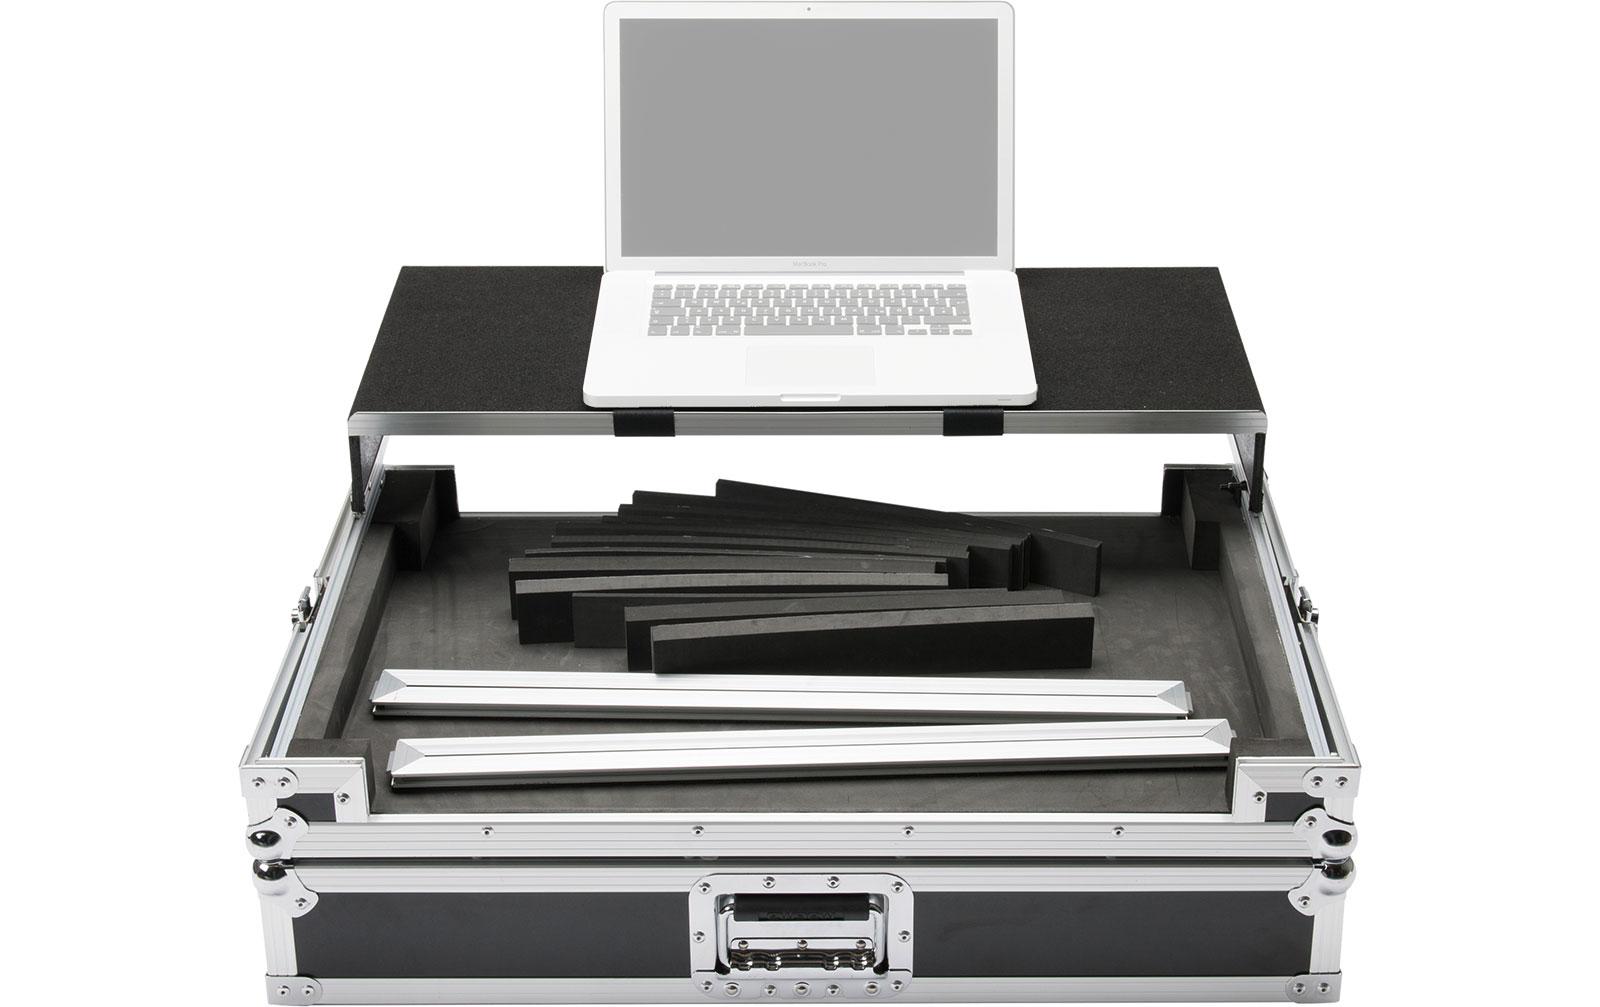 magma-multi-format-workstation-xxl-black-silver